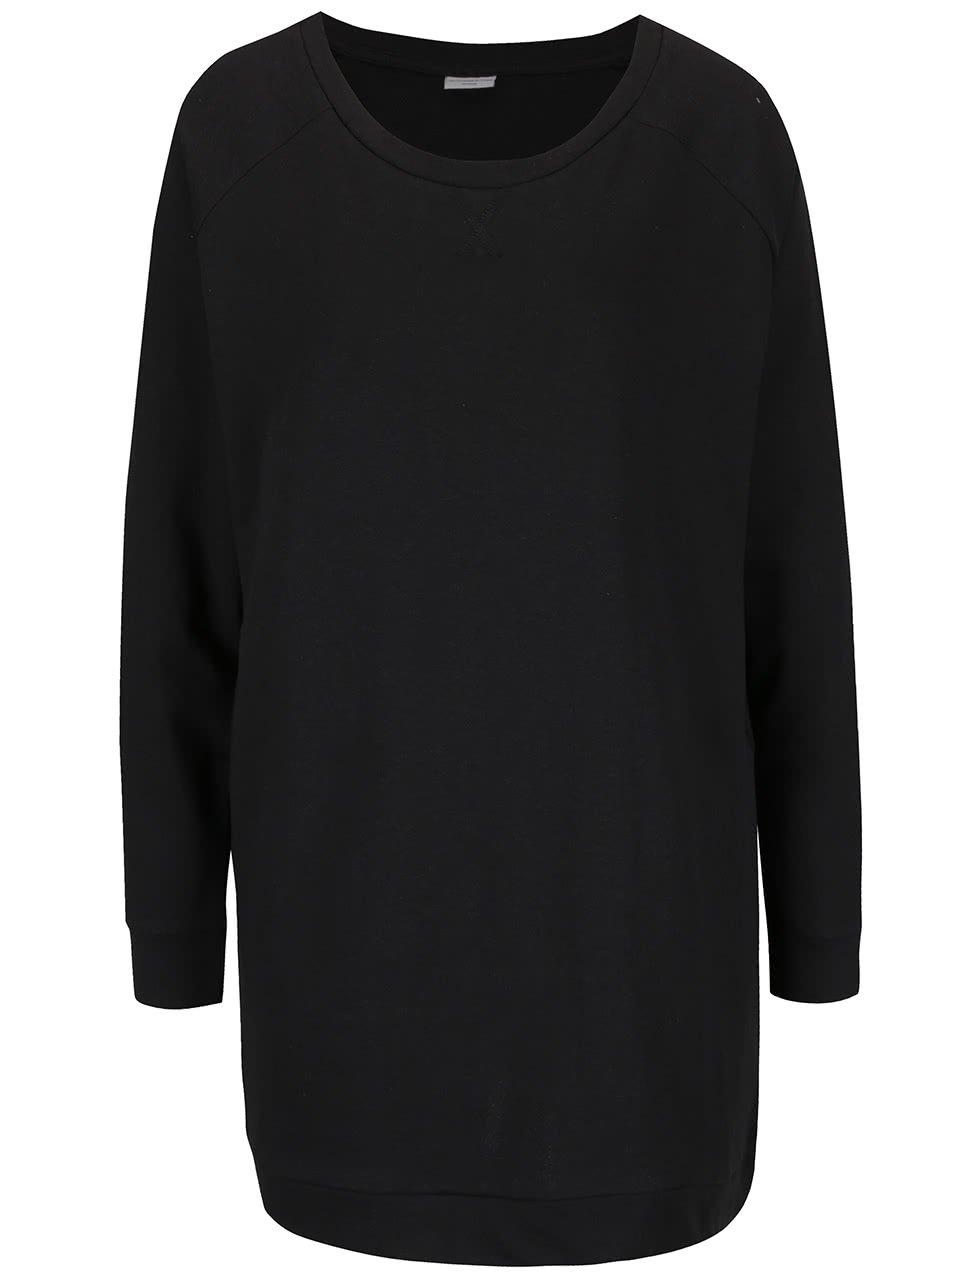 Černá dlouhá mikina Jacqueline de Yong Lexus